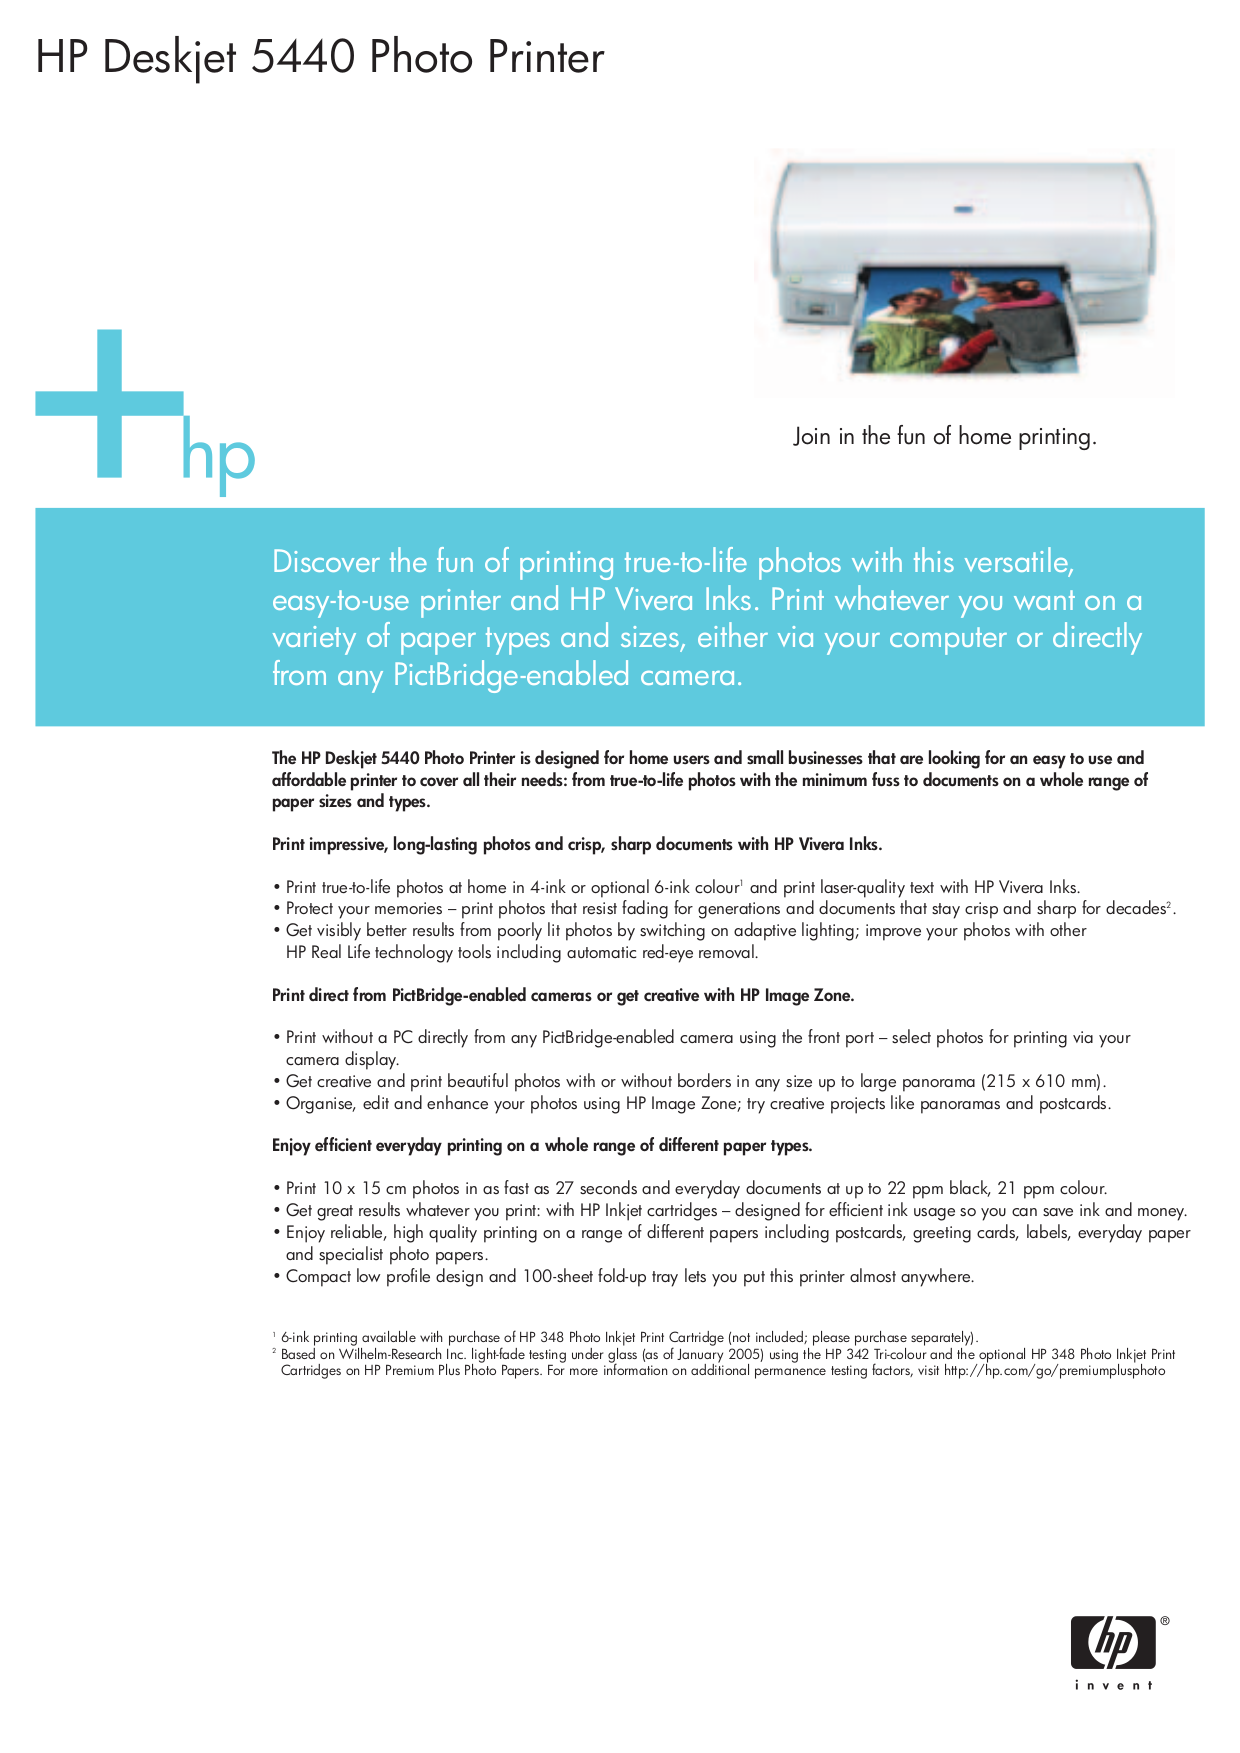 download free pdf for hp deskjet 5440 printer manual rh umlib com hp deskjet 5440 service manual HP Deskjet 1280